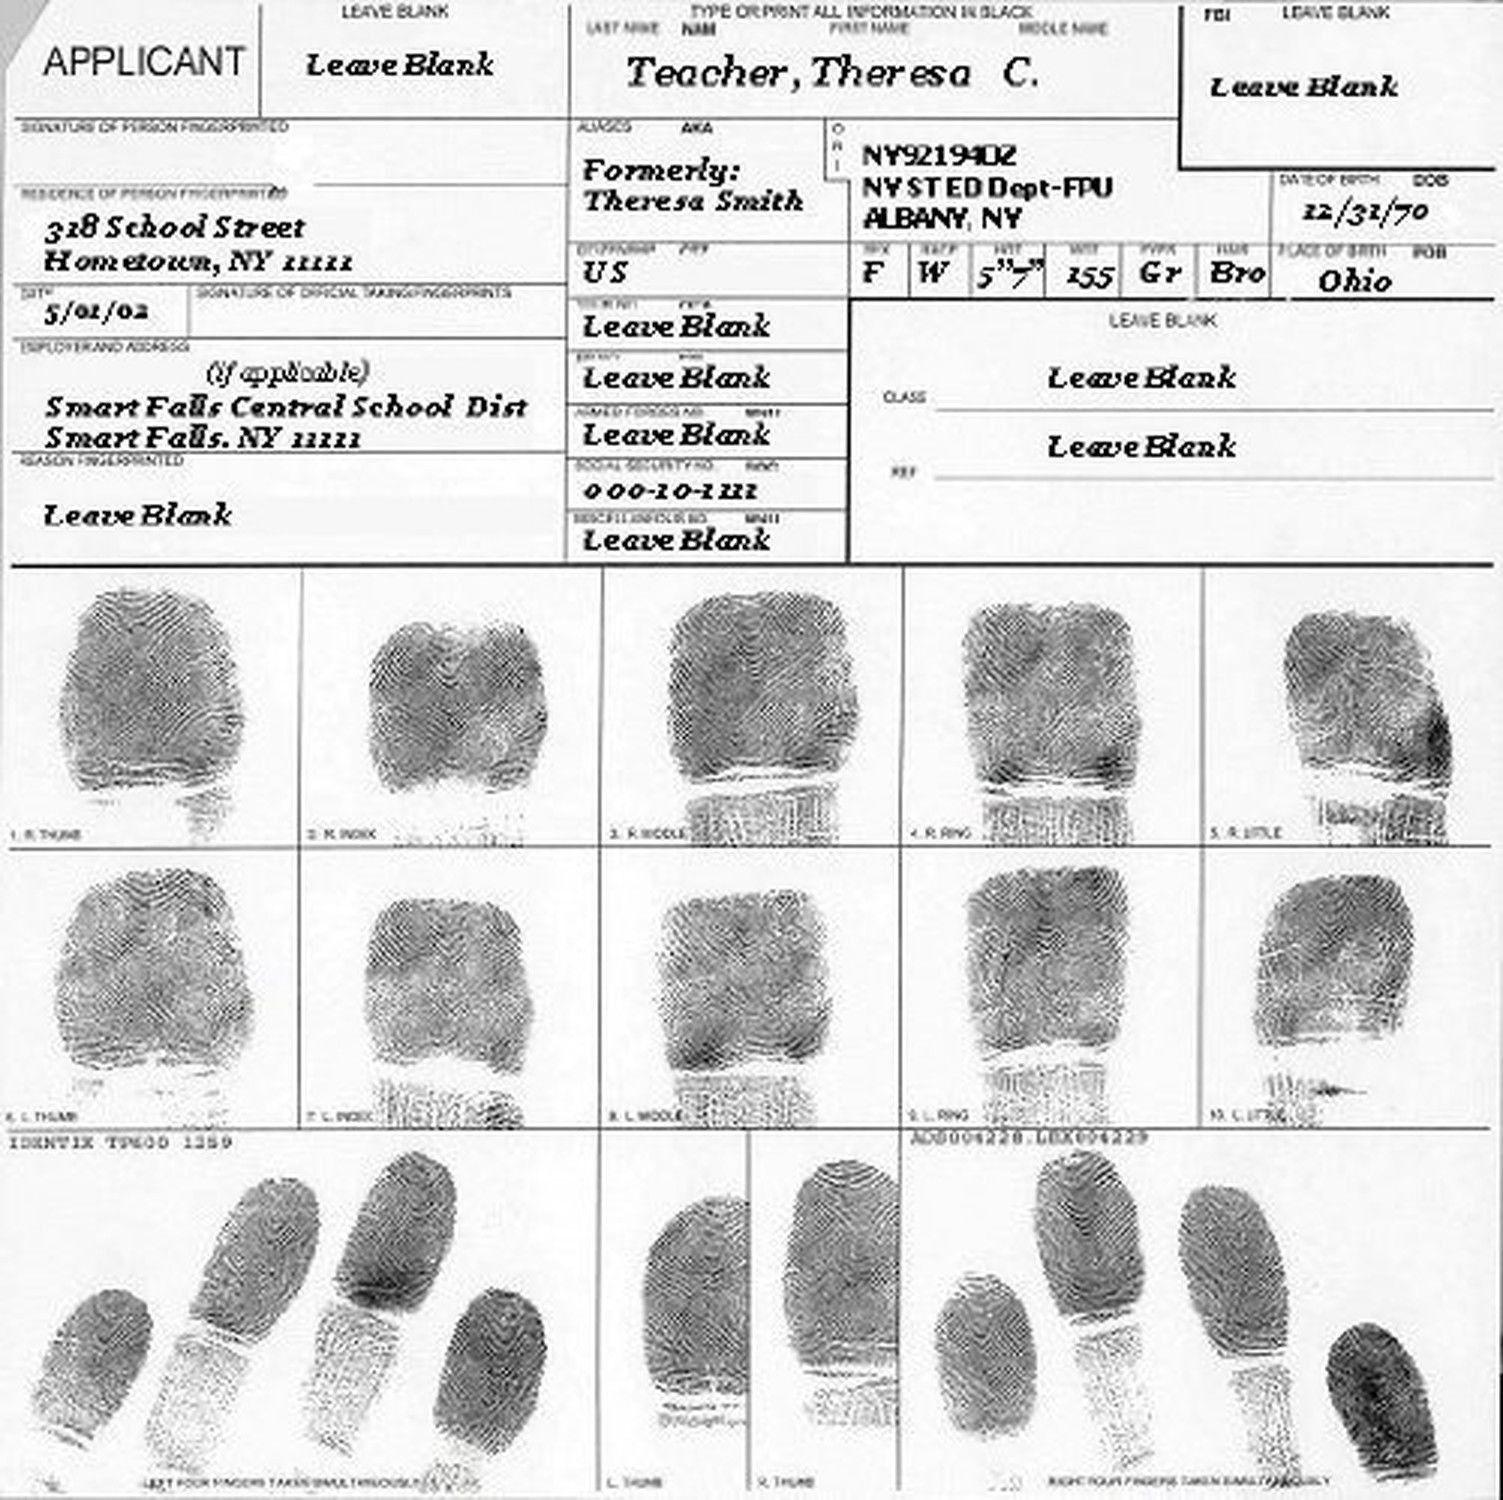 Fingerprint Cards Applicant Fd 258 5 Cards